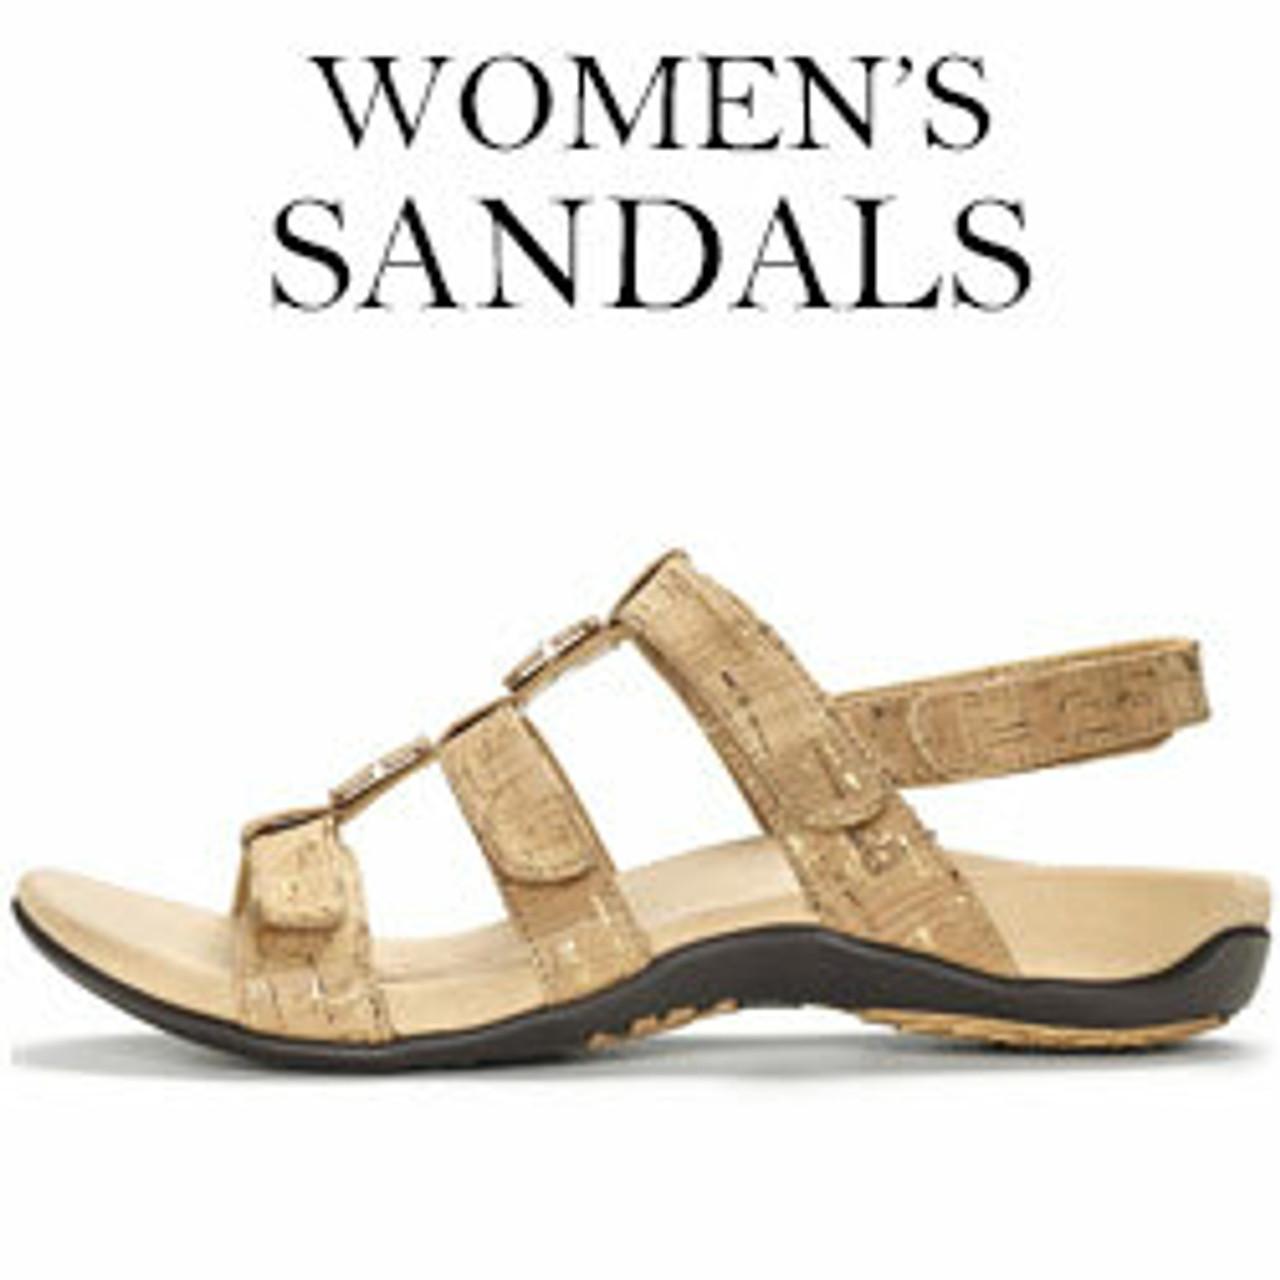 Orthopedic Sandals For Women   Orthotic Flip Flops